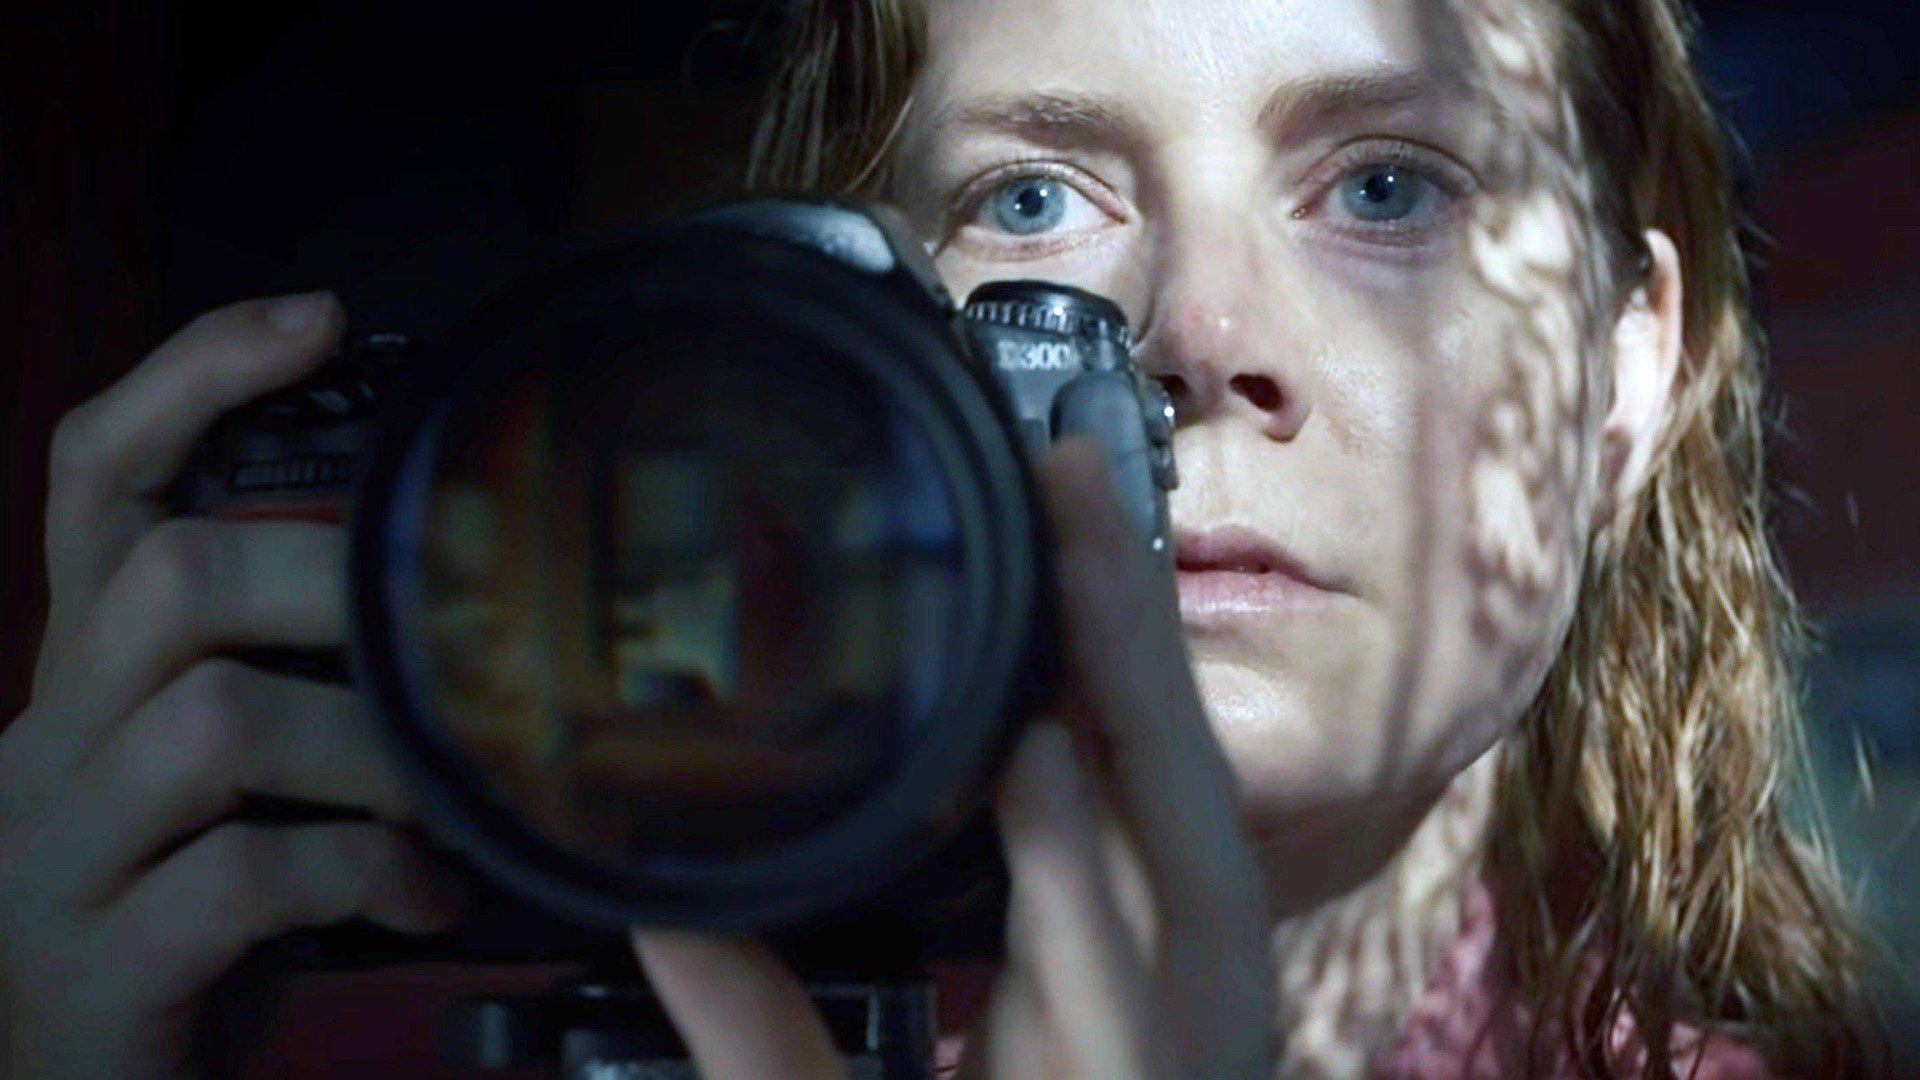 La mujer en la ventana, dirigida por Joe Wright